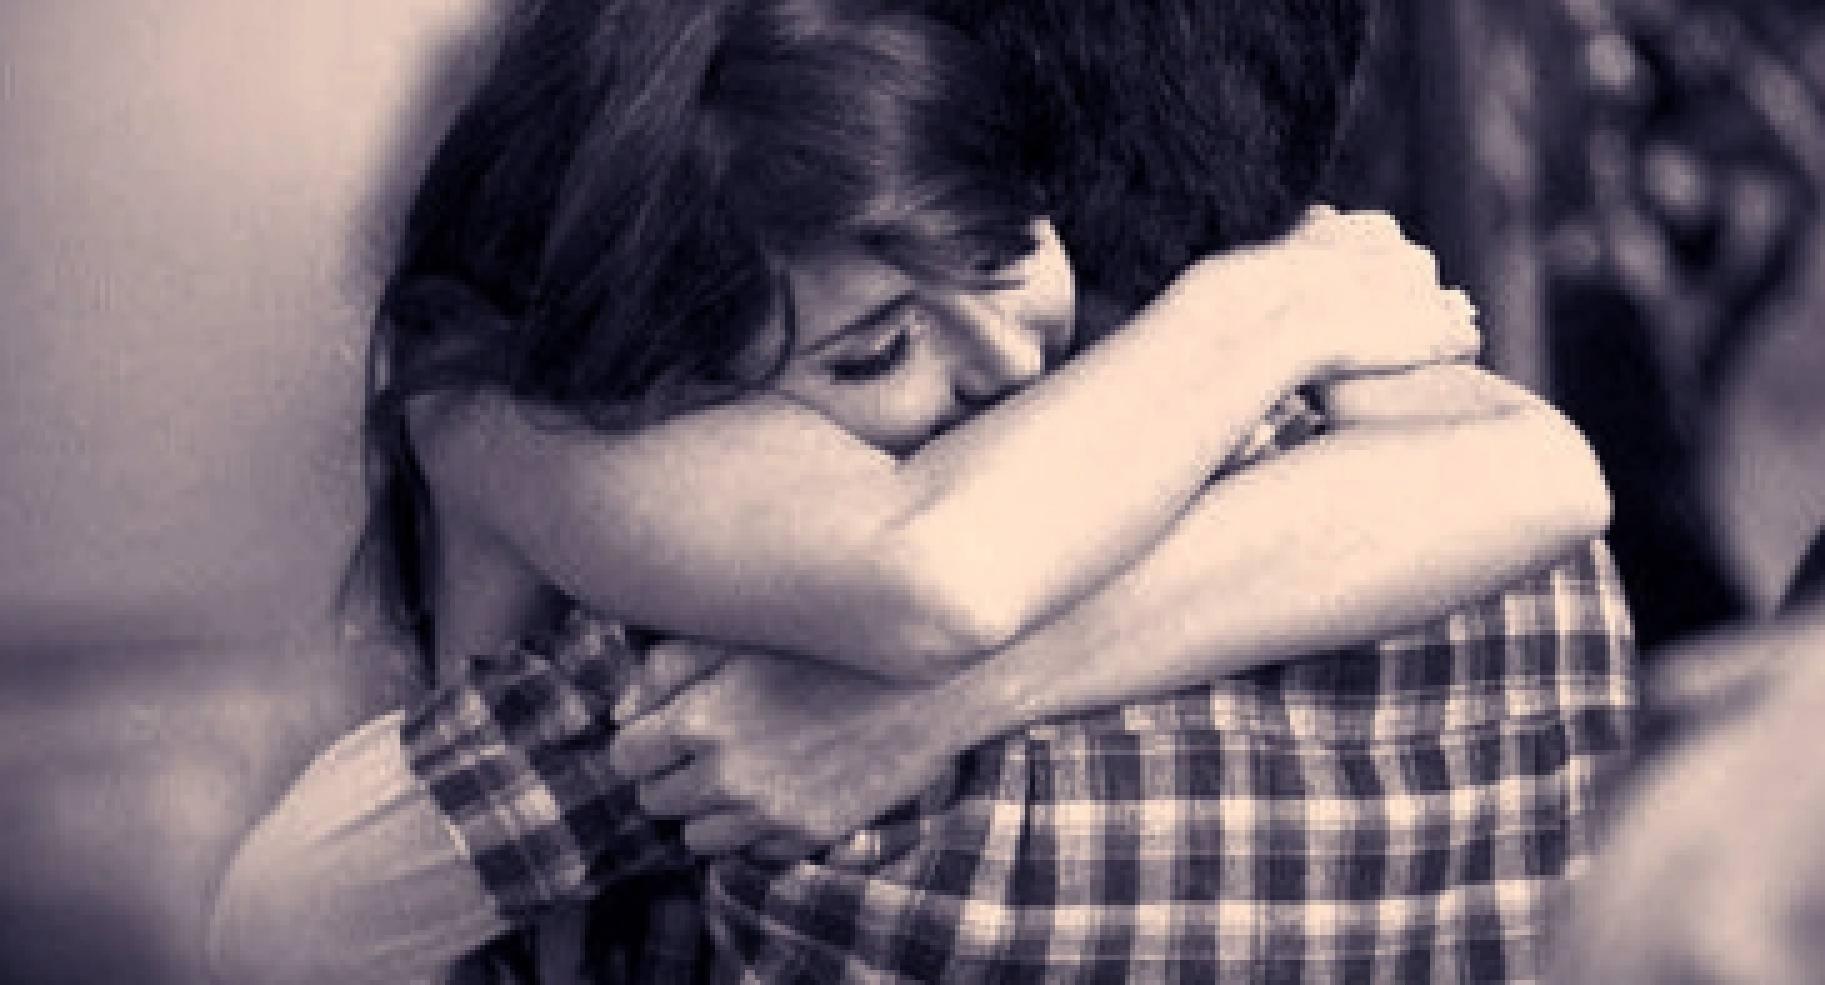 Девушка крепко обнимает